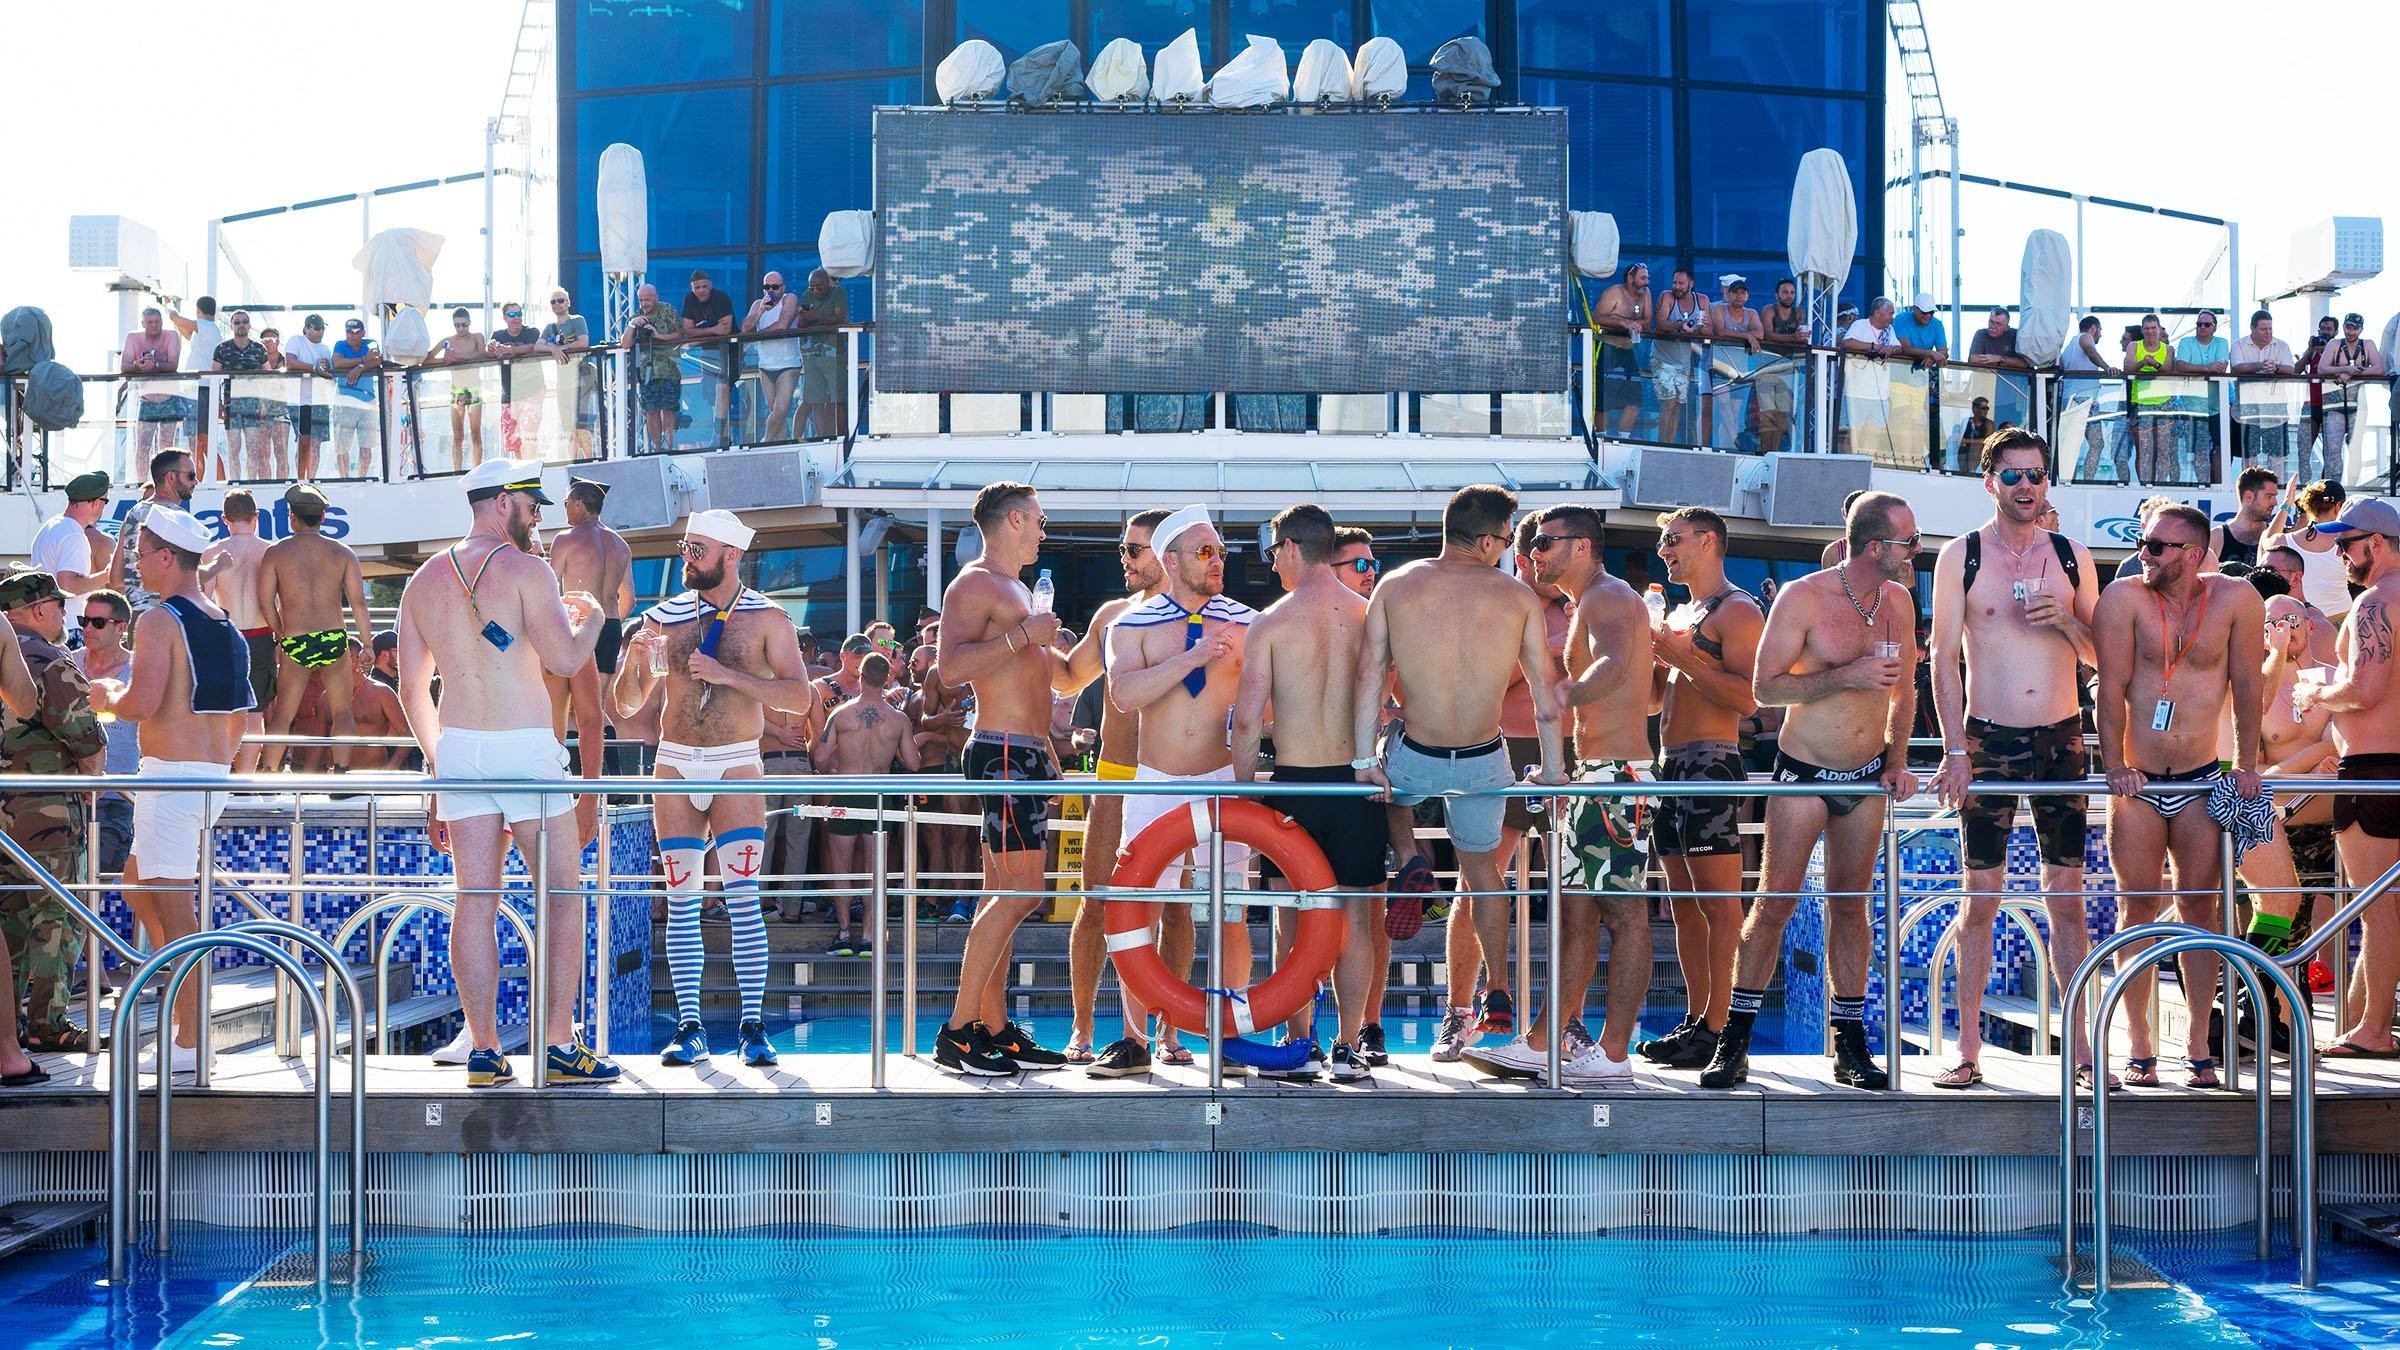 Viaje en barco para gays desde España